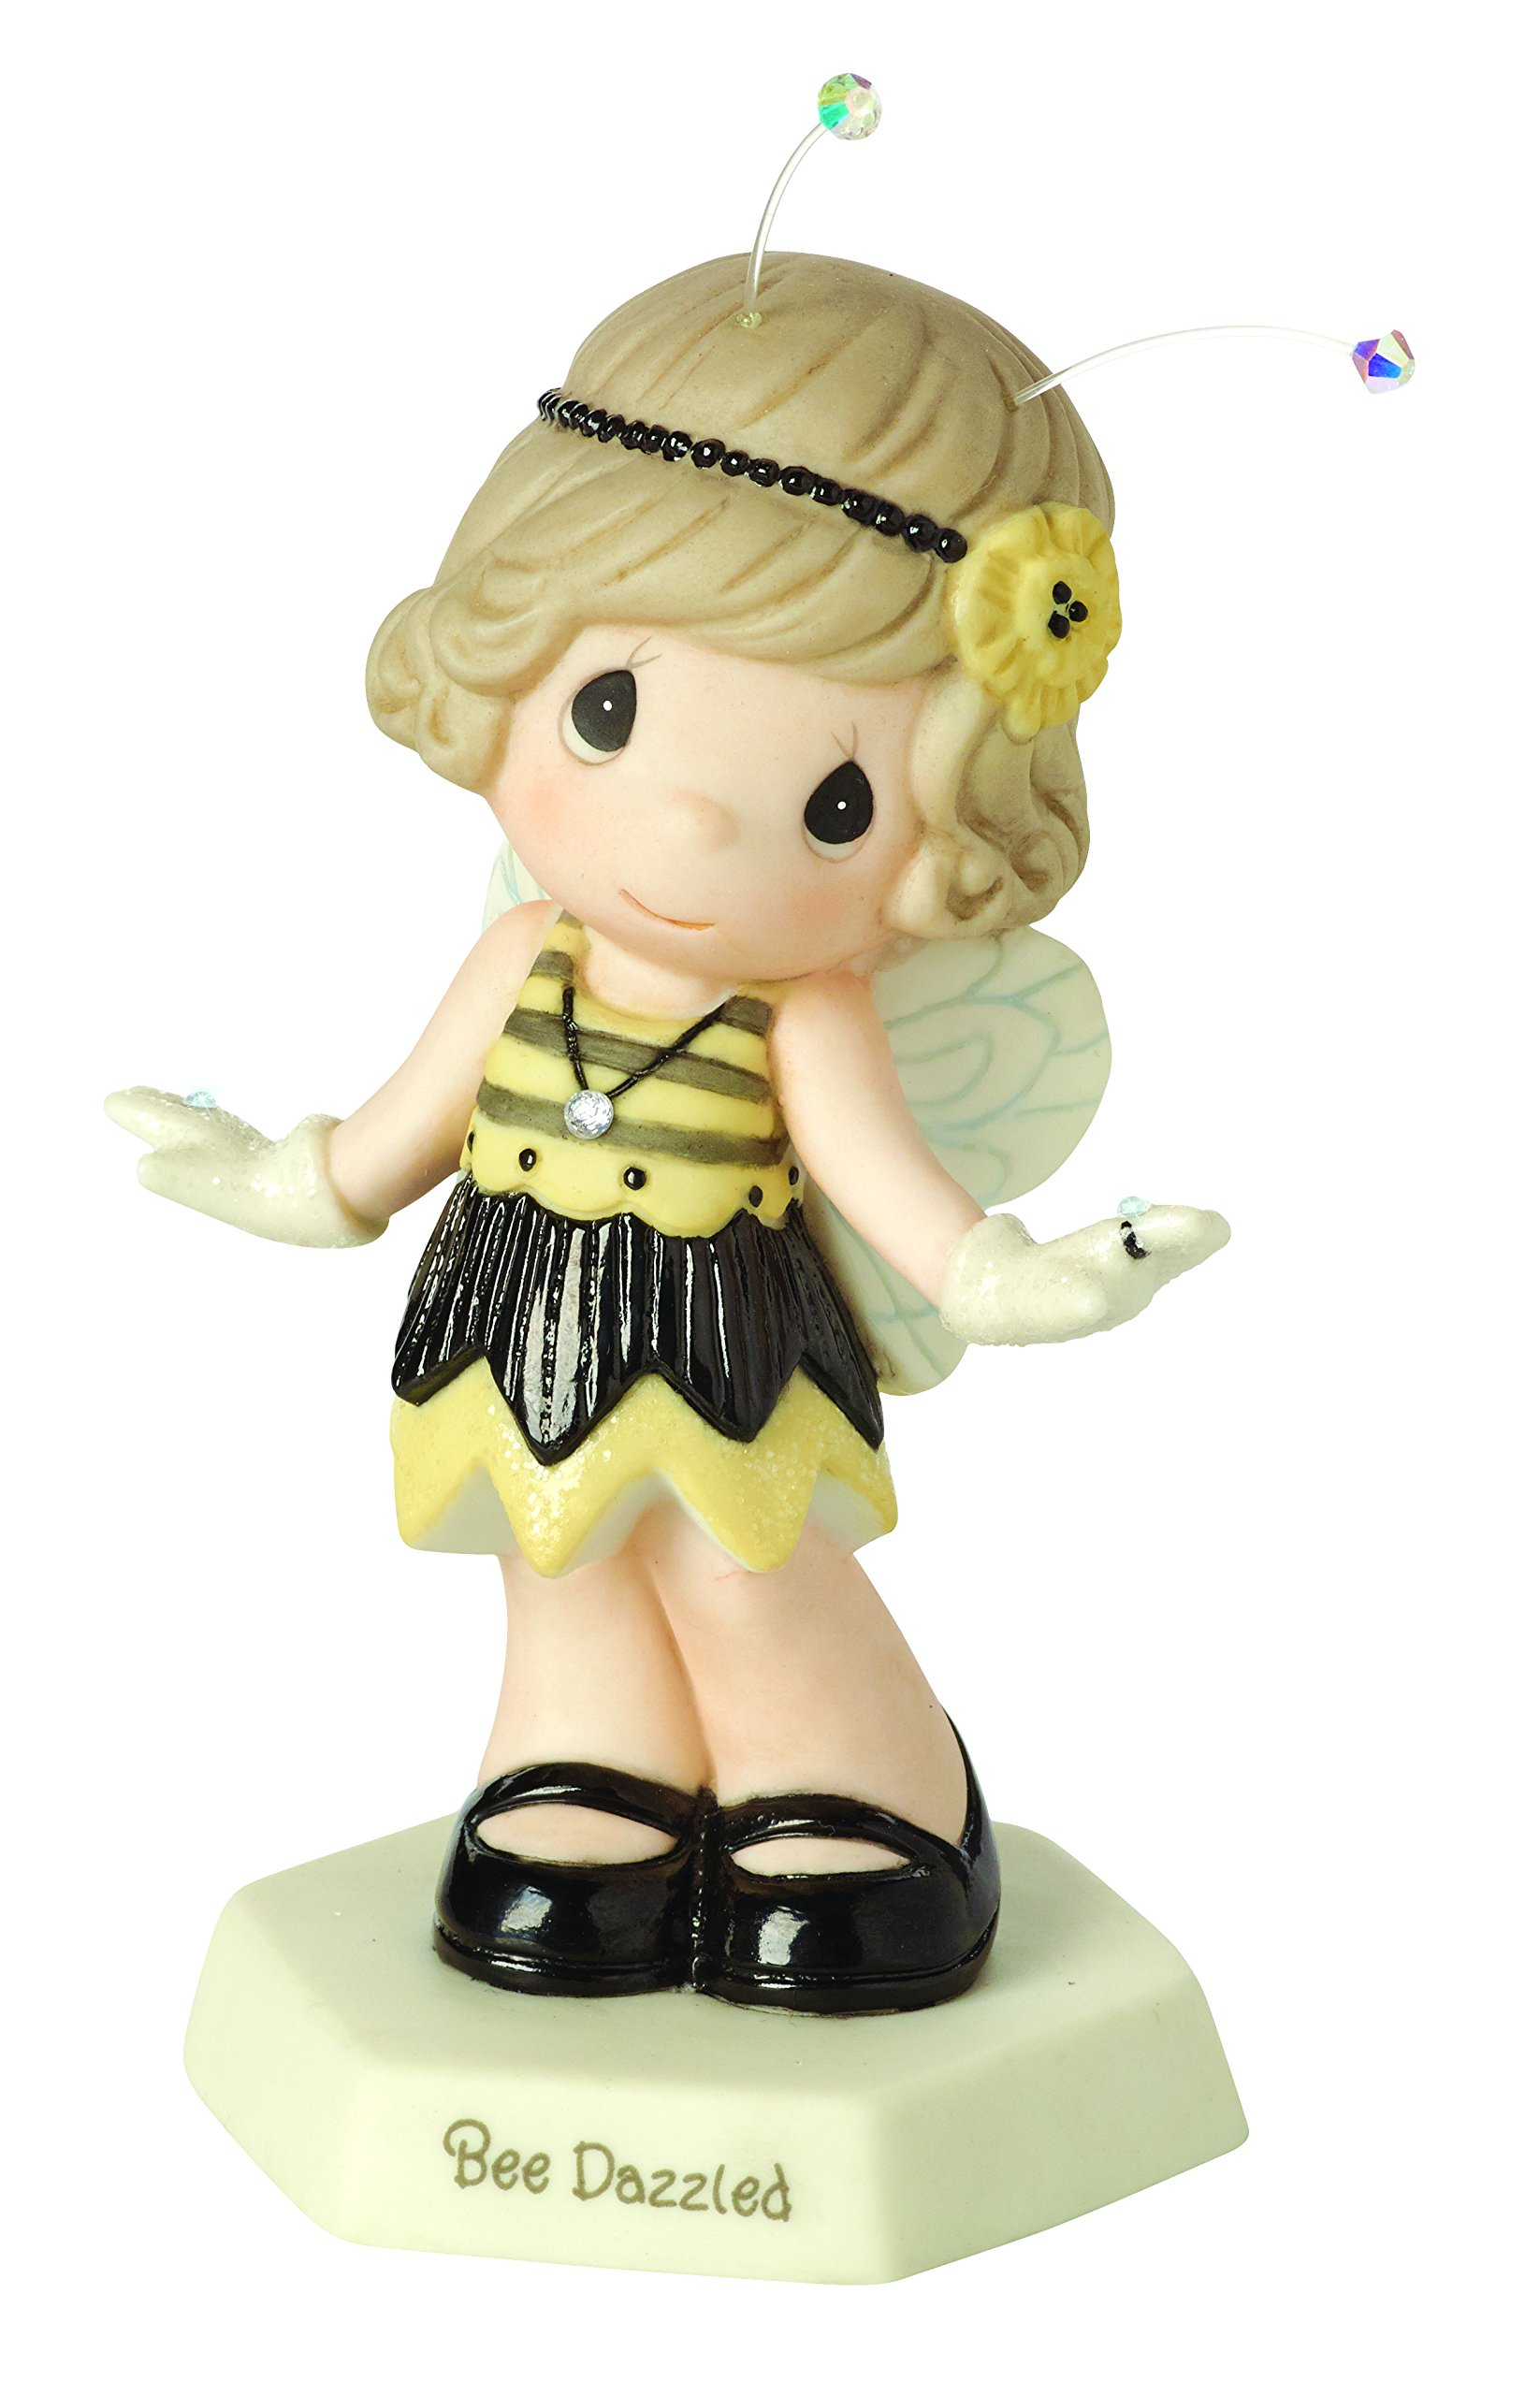 Precious Moments,  Bee Dazzled Bisque Porcelain Figurine, 153019